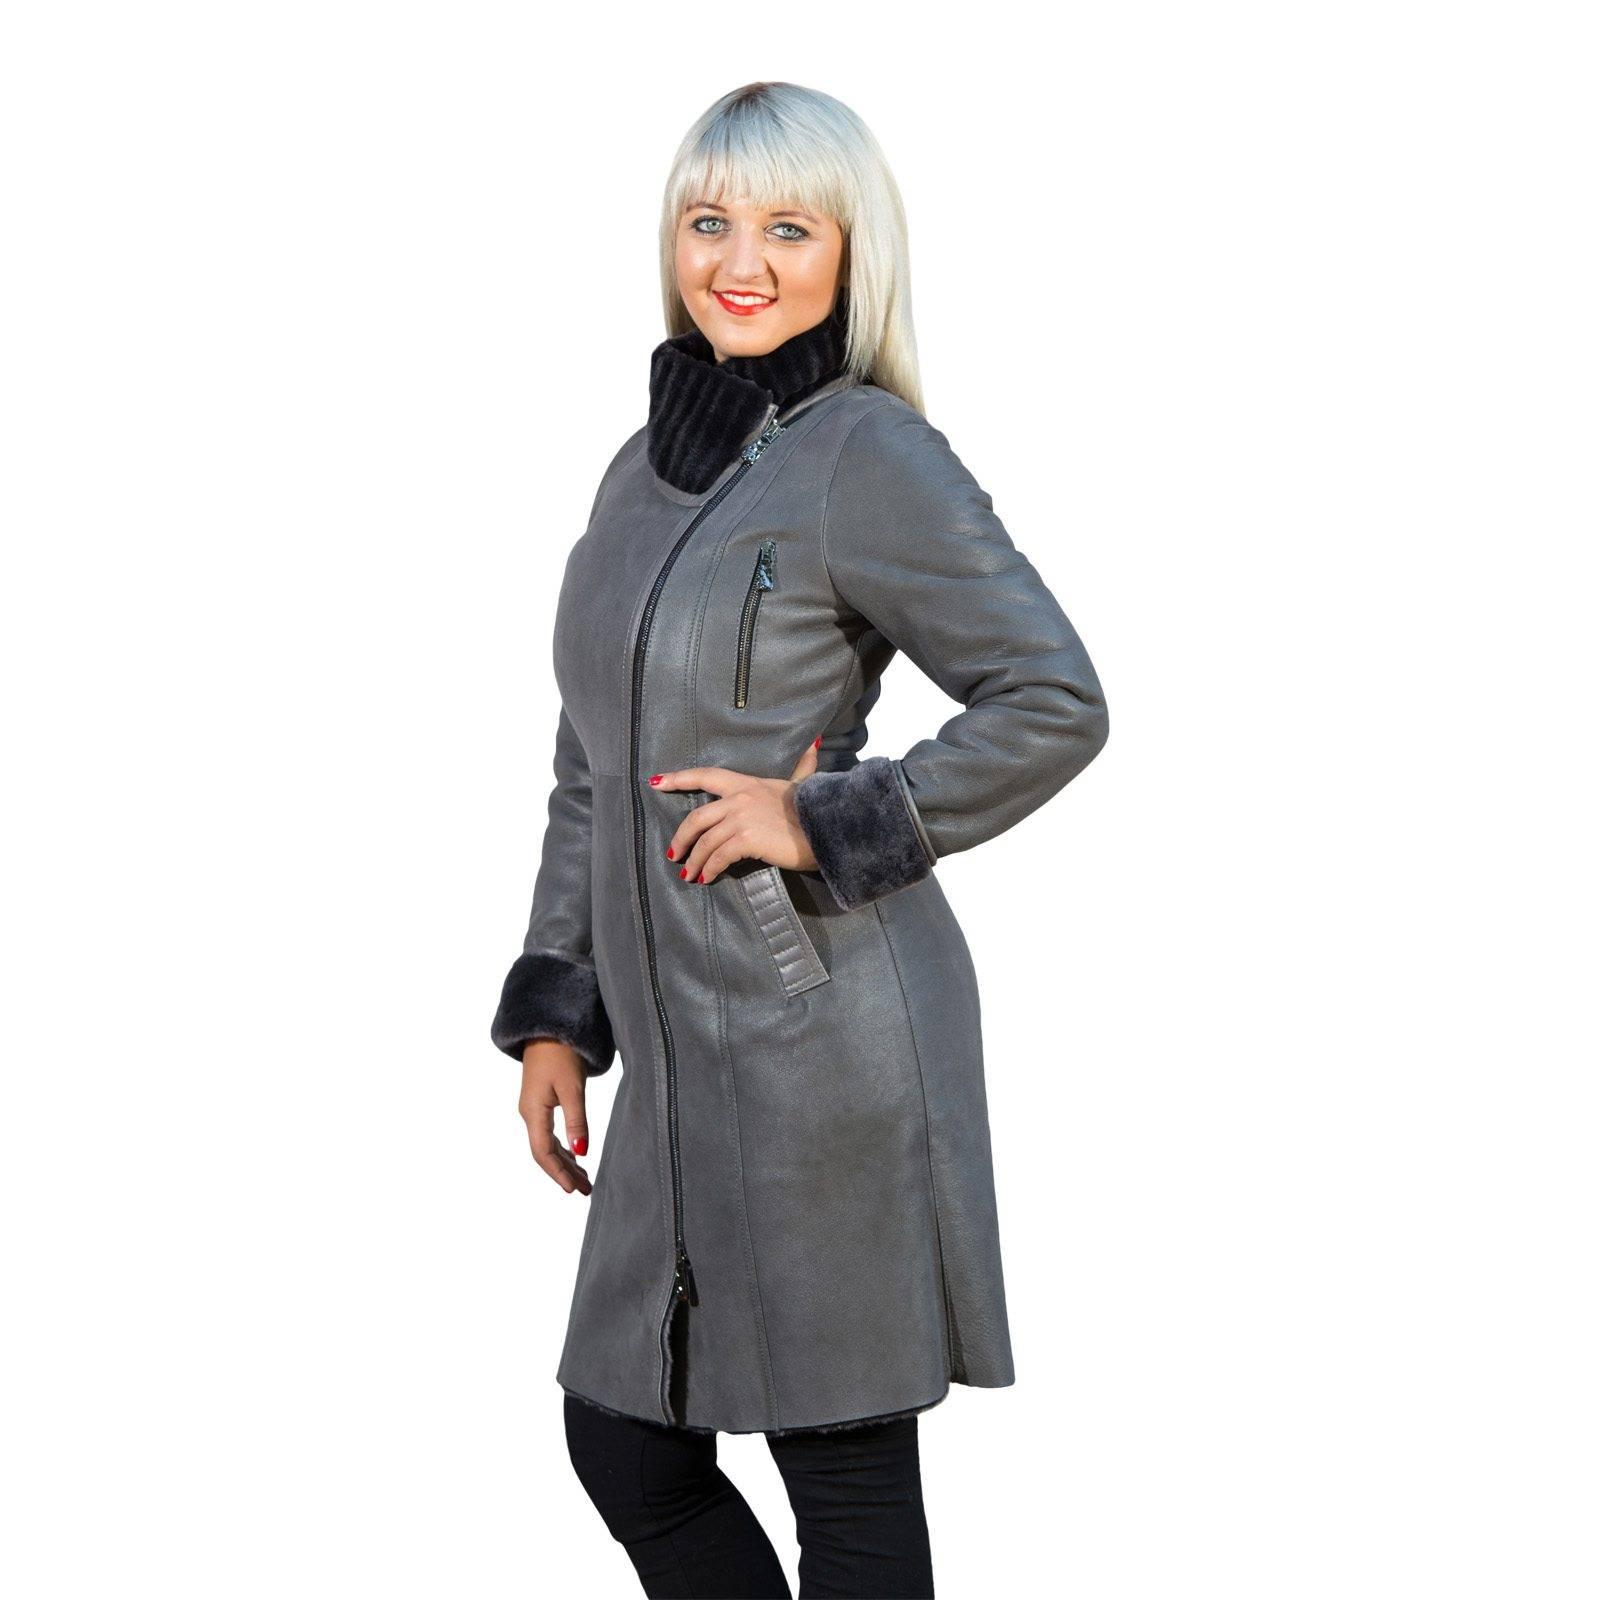 lammfellmantel ida damen mantel grau merino veloursleder ebay. Black Bedroom Furniture Sets. Home Design Ideas